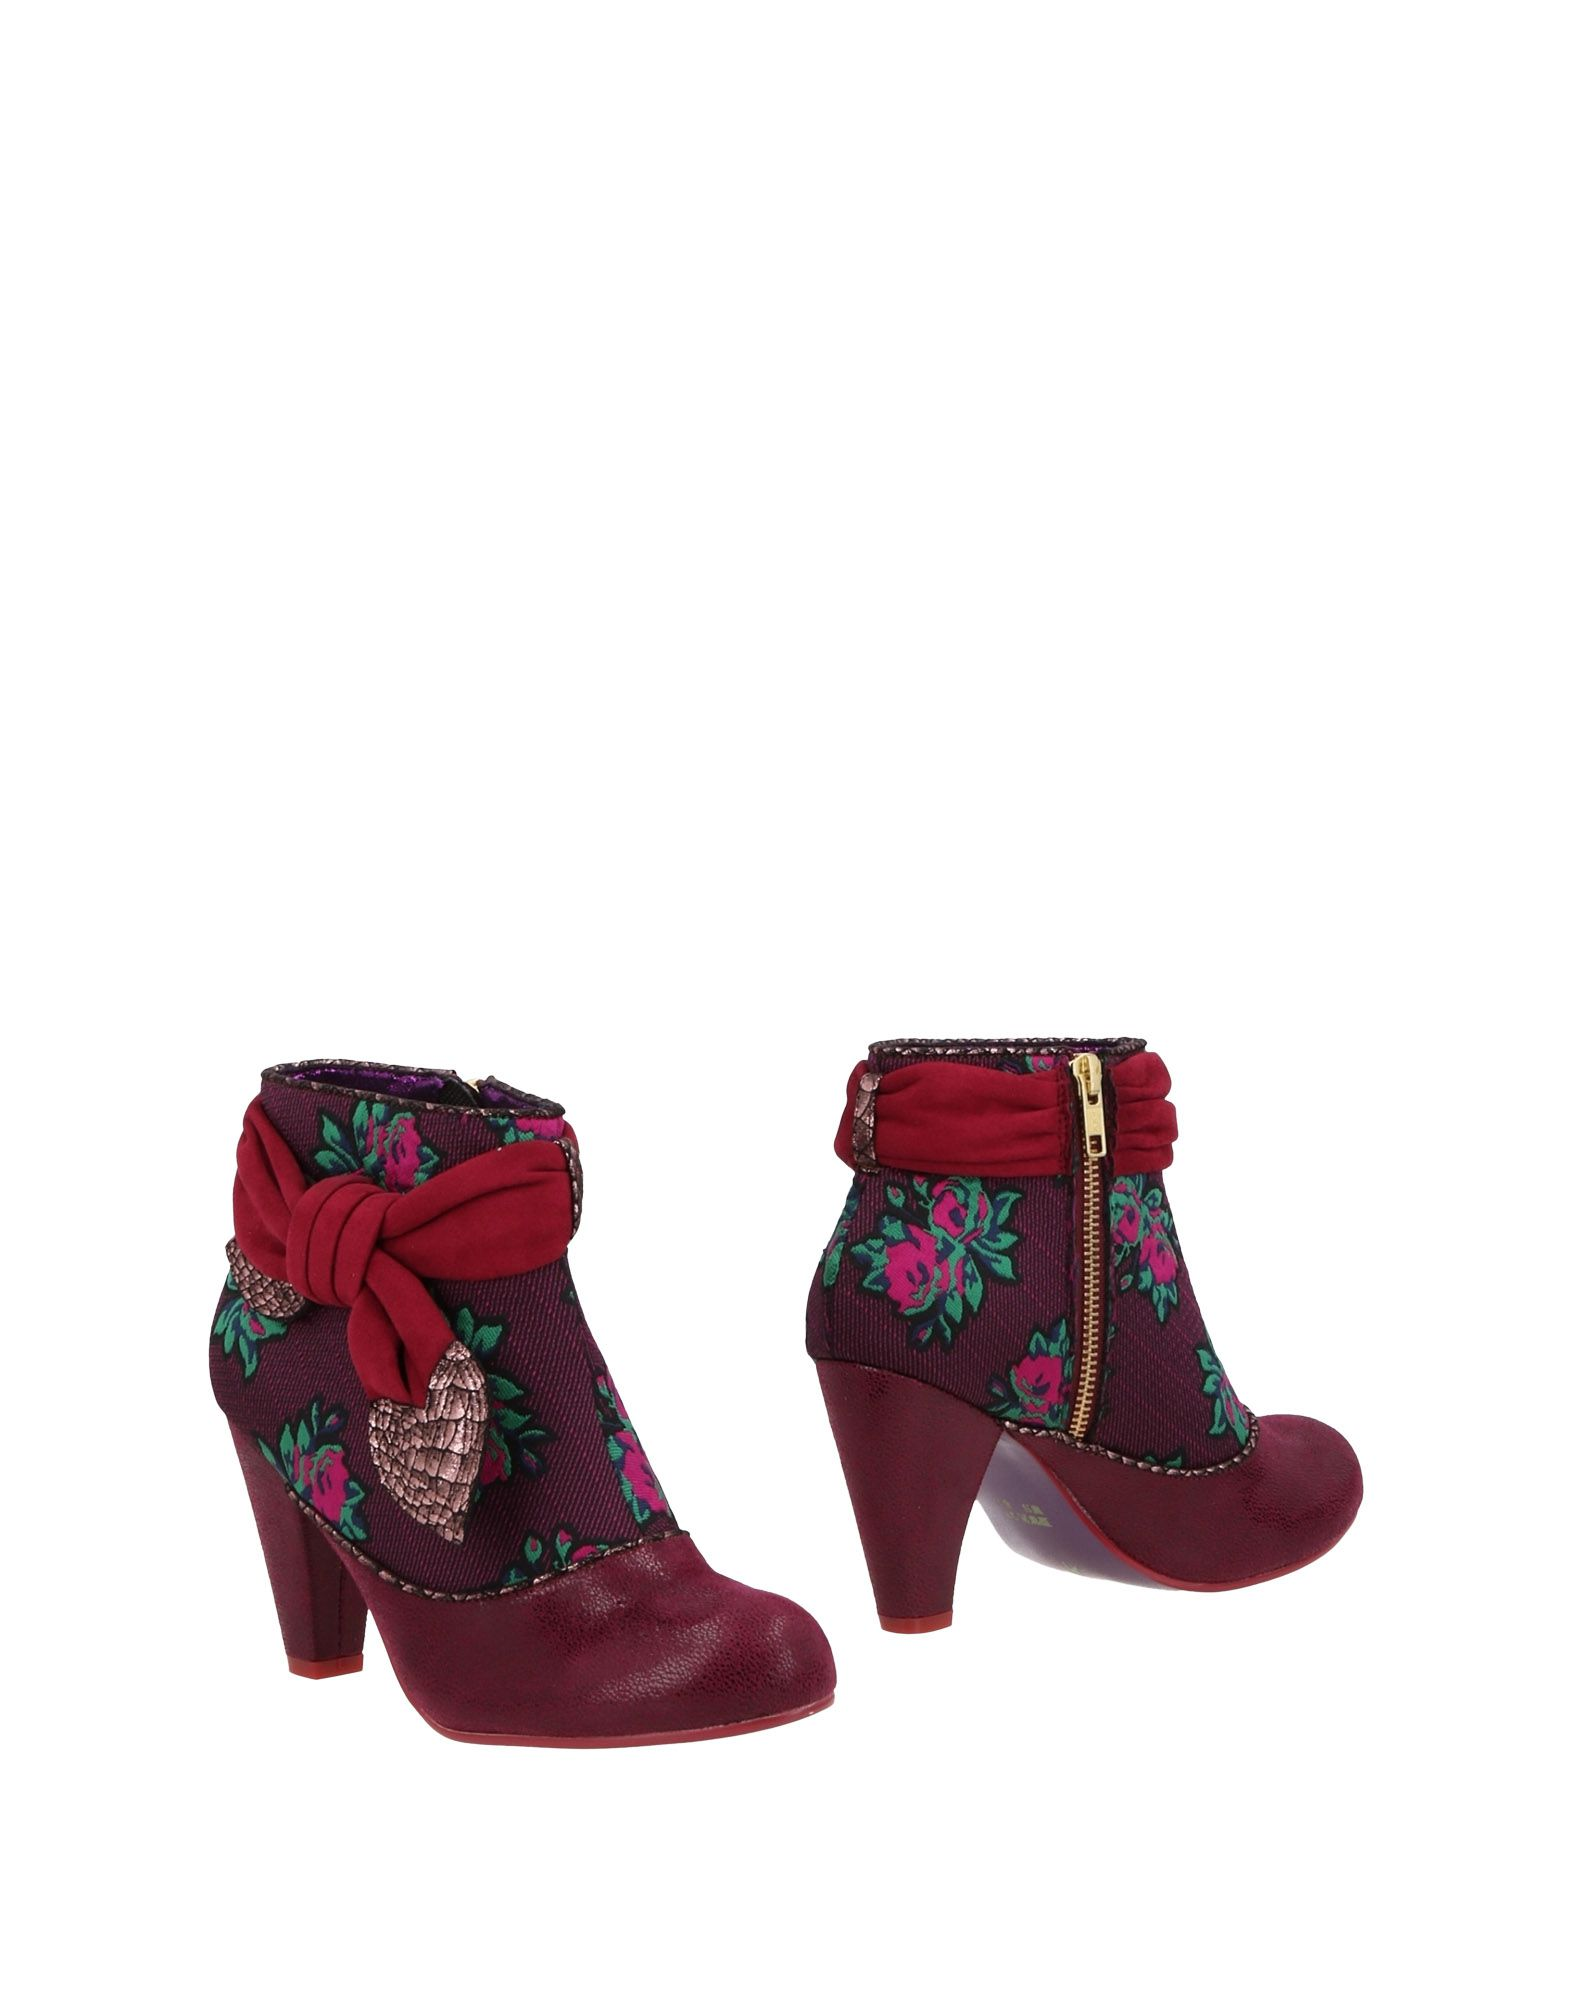 Poetic Licence Stiefelette Damen beliebte  11482080PK Gute Qualität beliebte Damen Schuhe 34d423